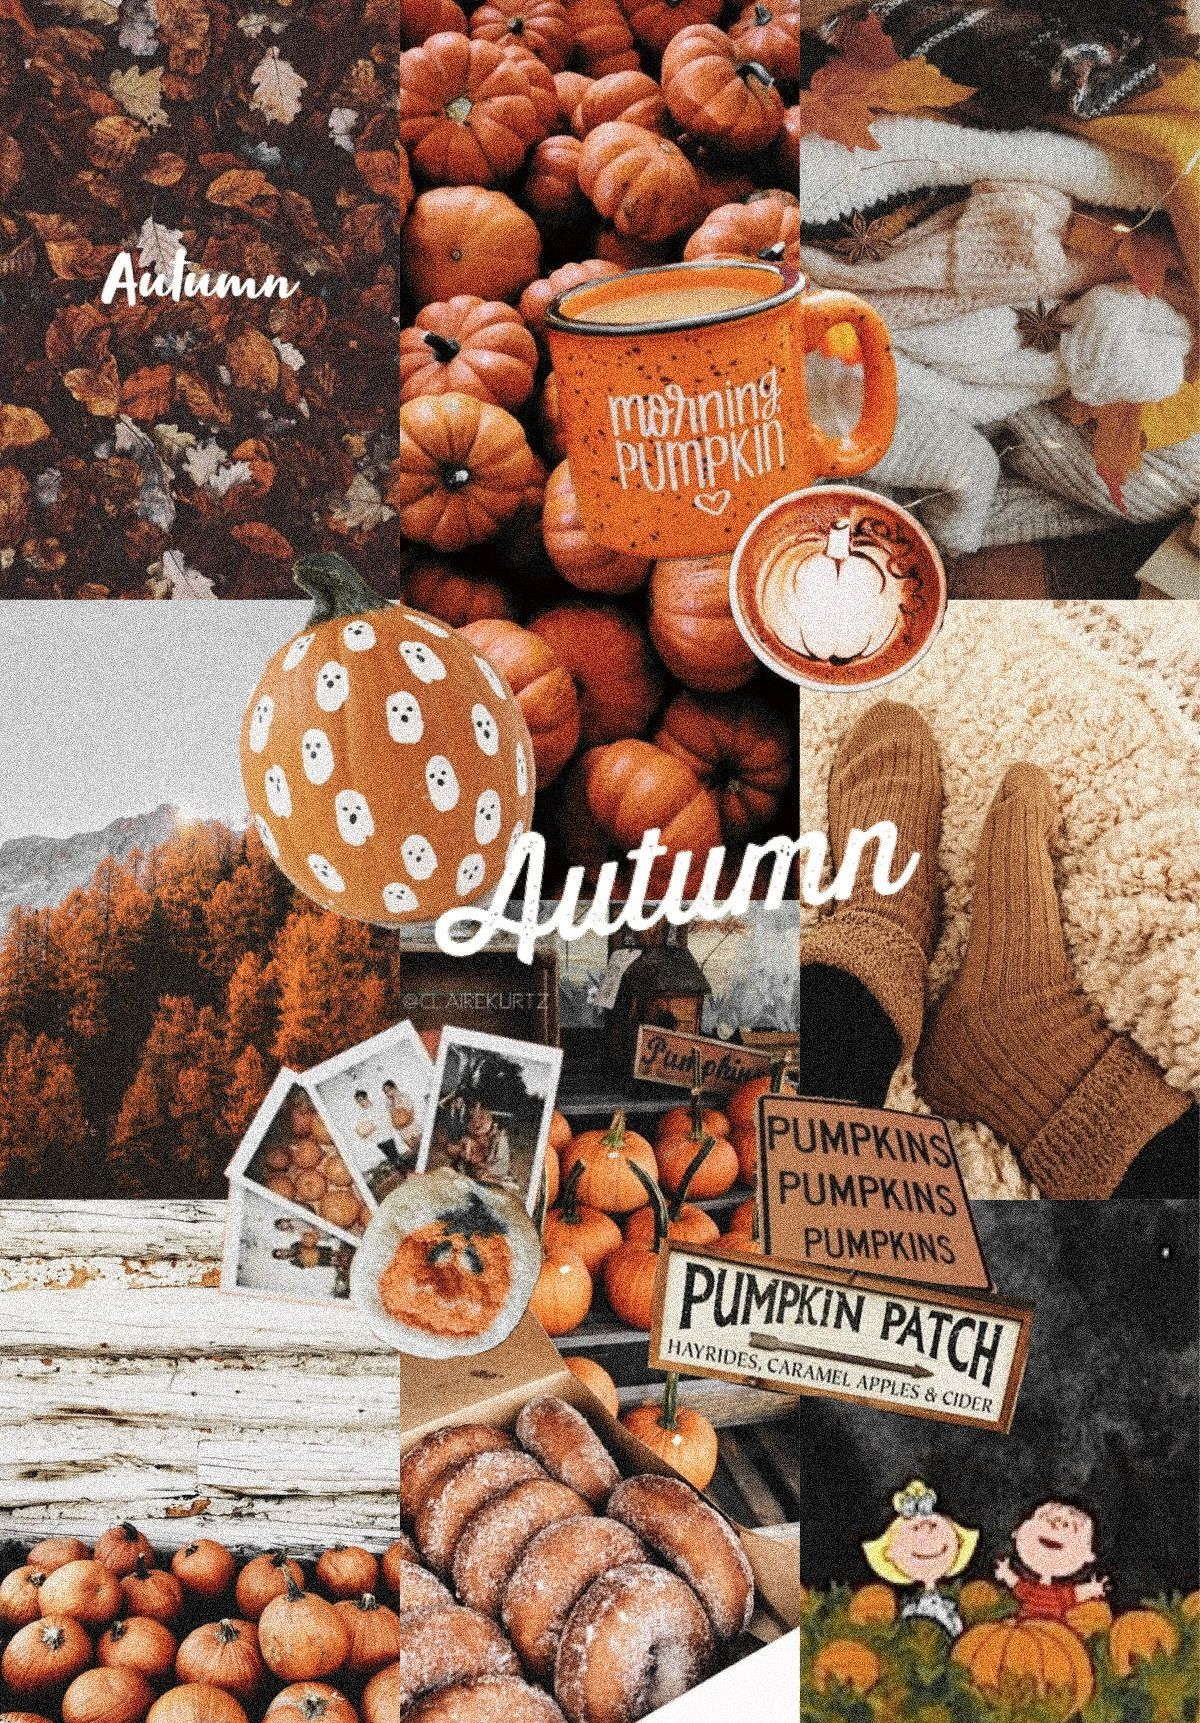 Autumn Fall Aesthetic Vsco Collage Iphone Wallpaper Aesthetic Autumn Collage Fall Ipho Iphone Wallpaper Fall Cute Fall Wallpaper Pumpkin Wallpaper